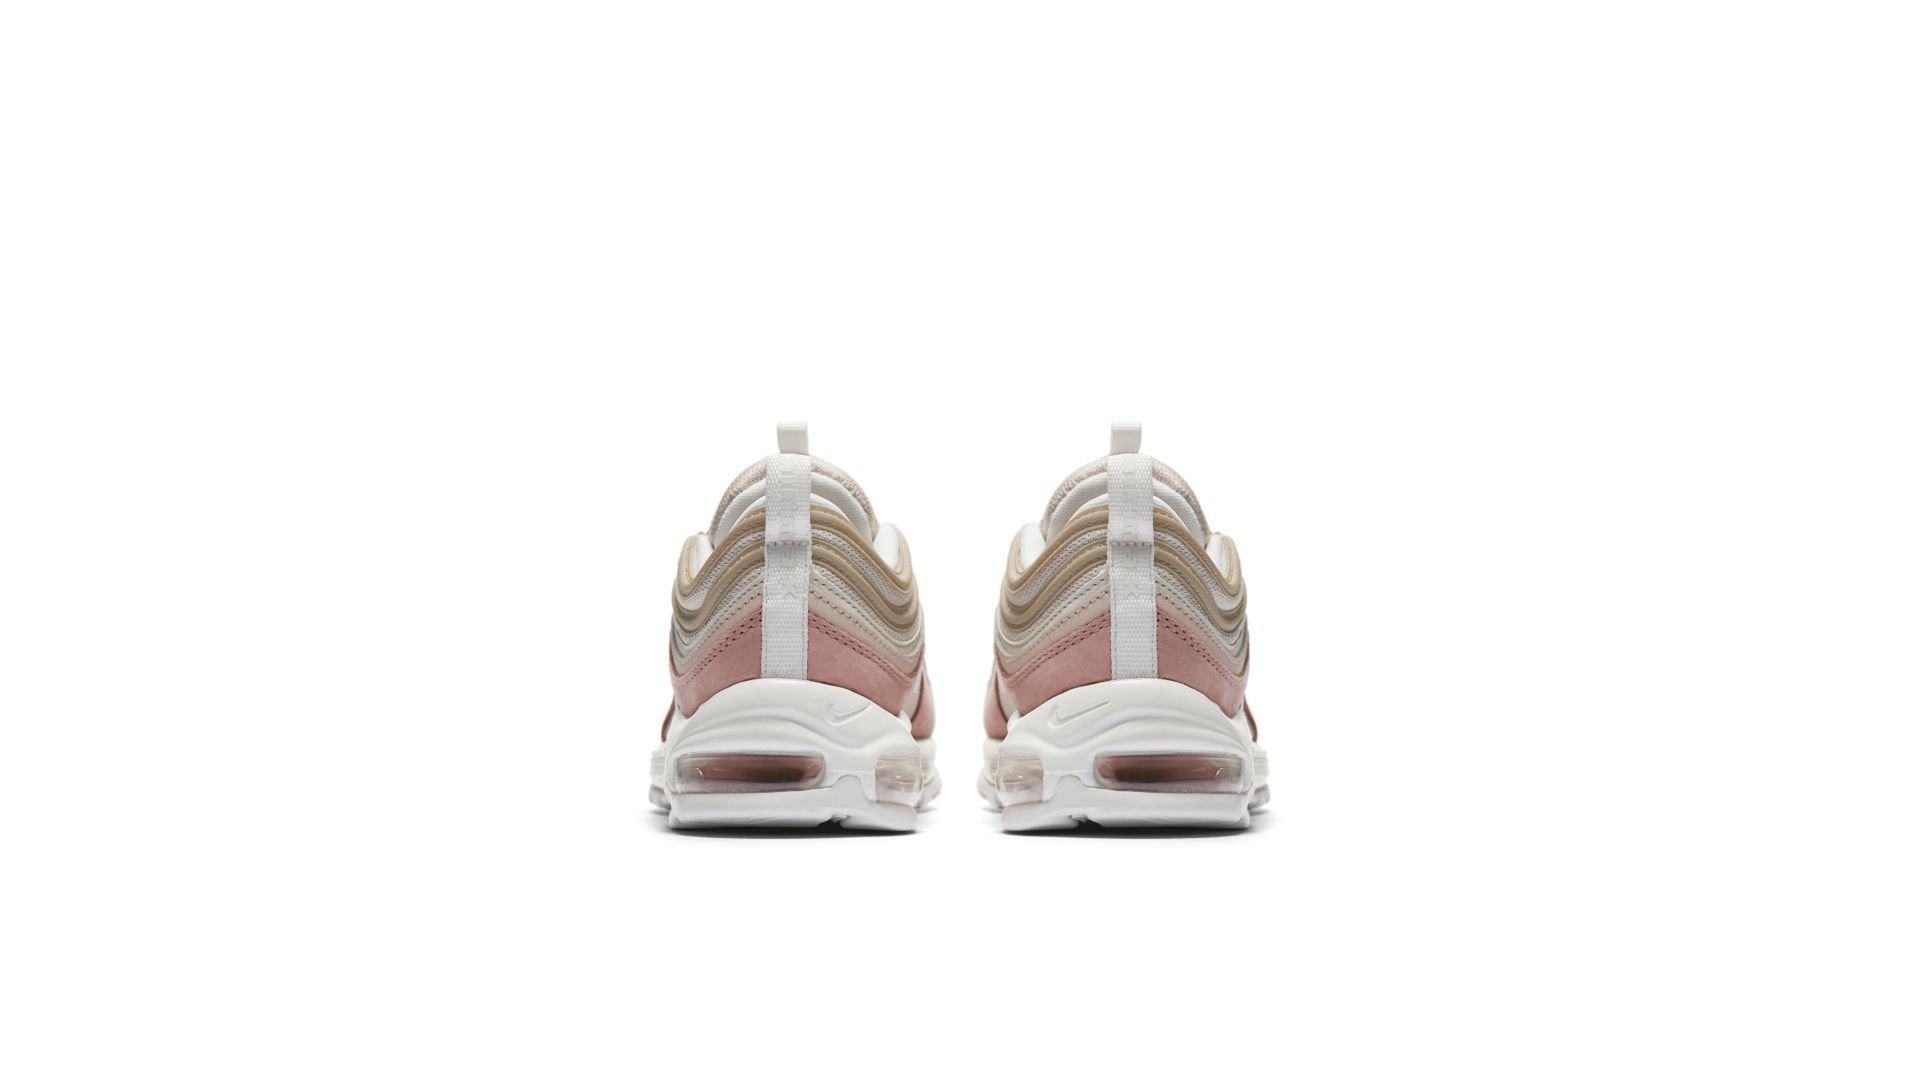 Nike Wmns Air Max 97 Premium Rush Pink (312834-200)